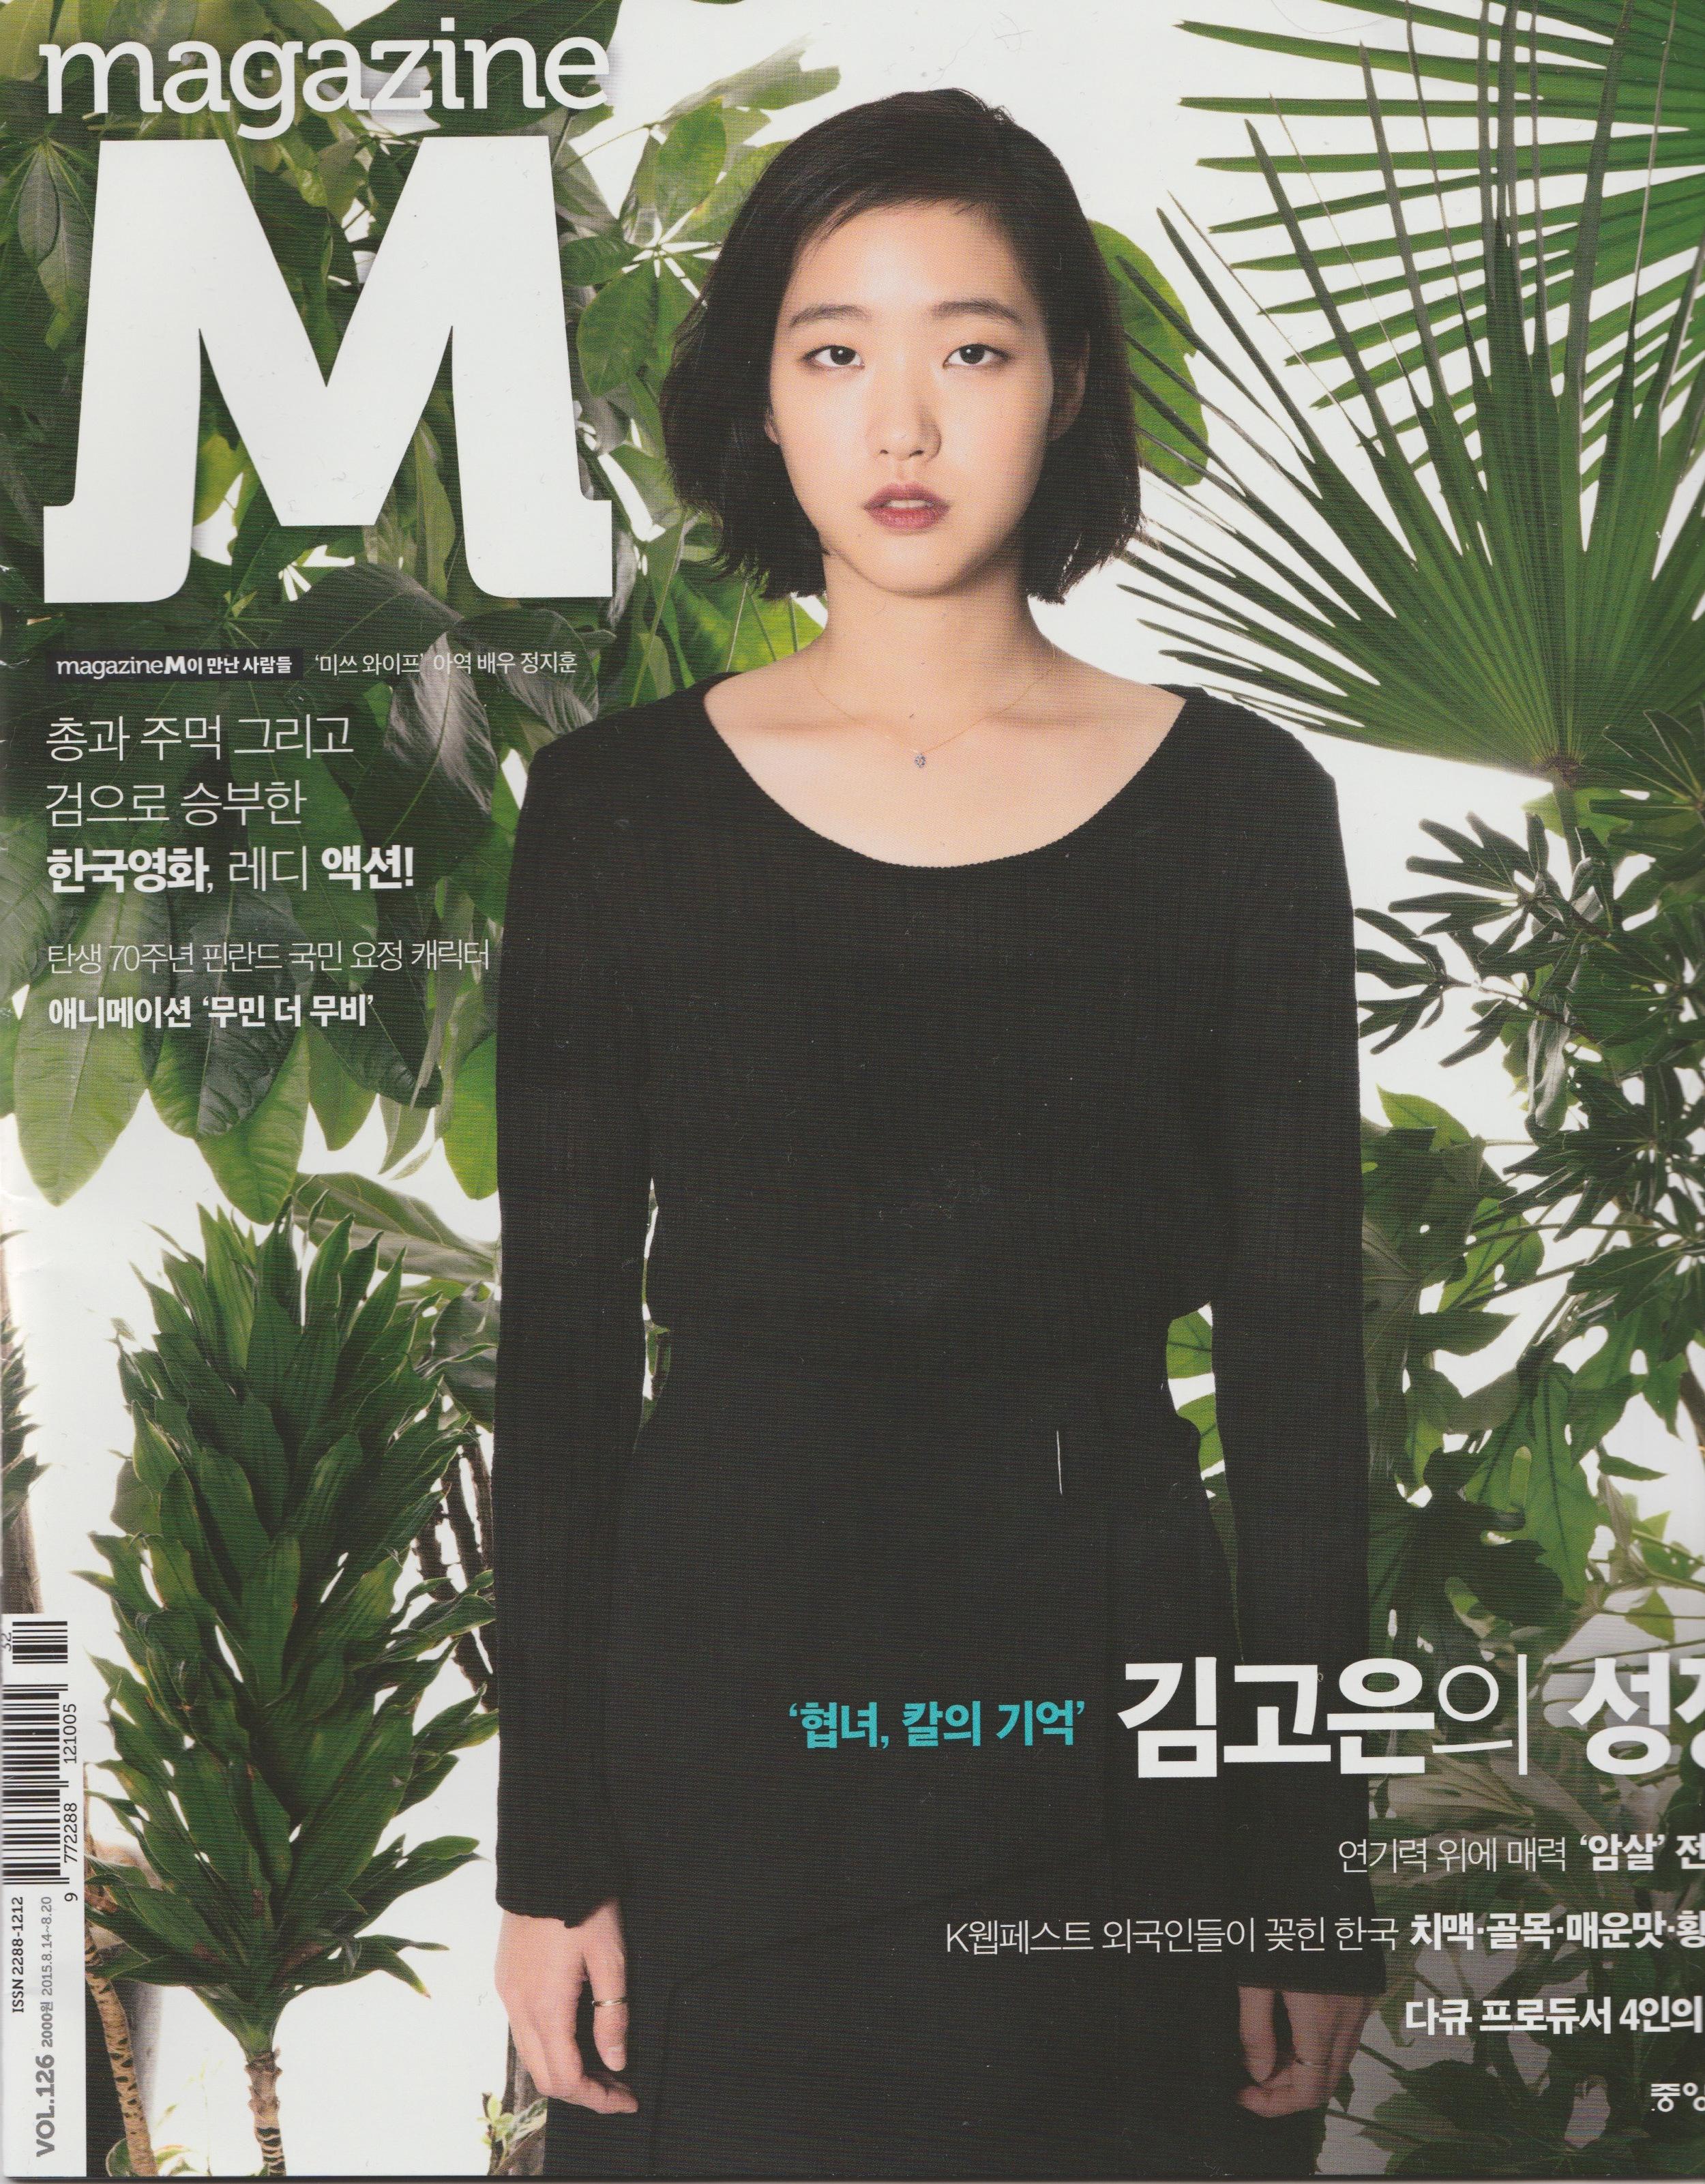 Magazine.jpeg